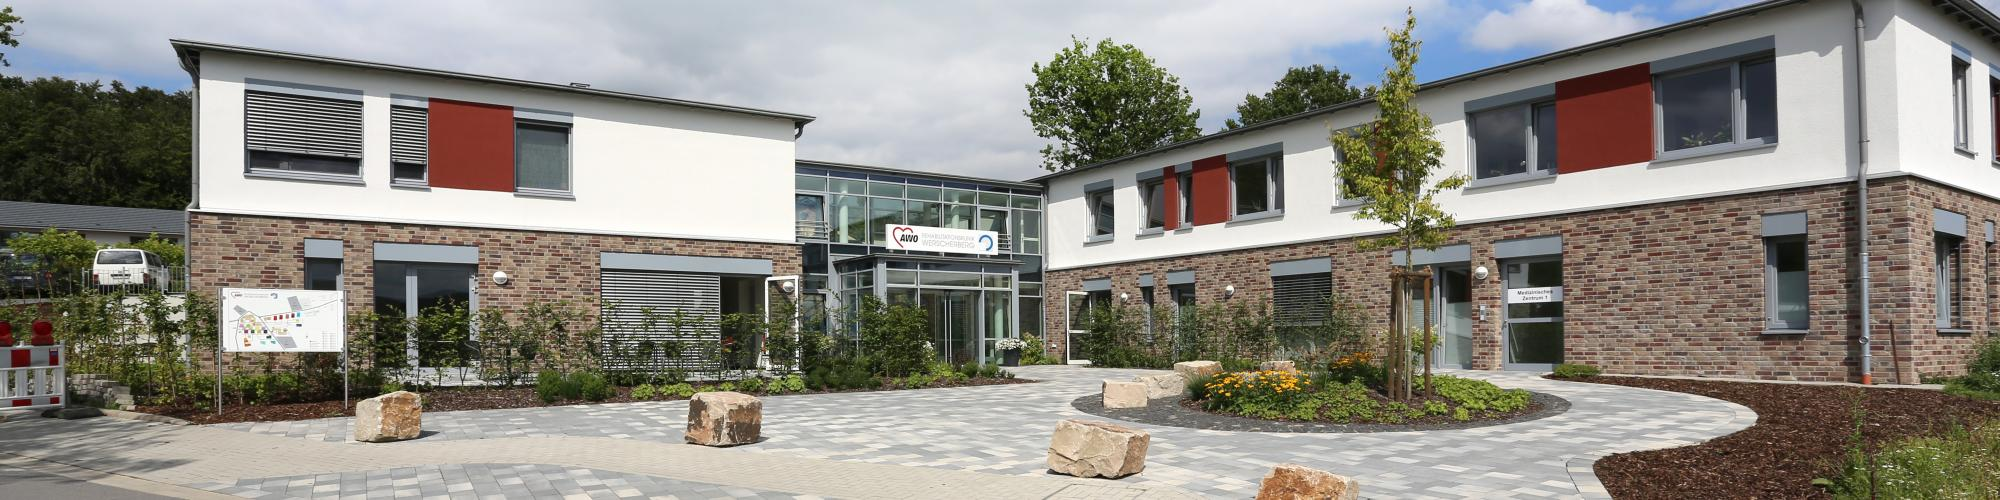 AWO Rehabilitationsklinik Werscherberg gGmbH